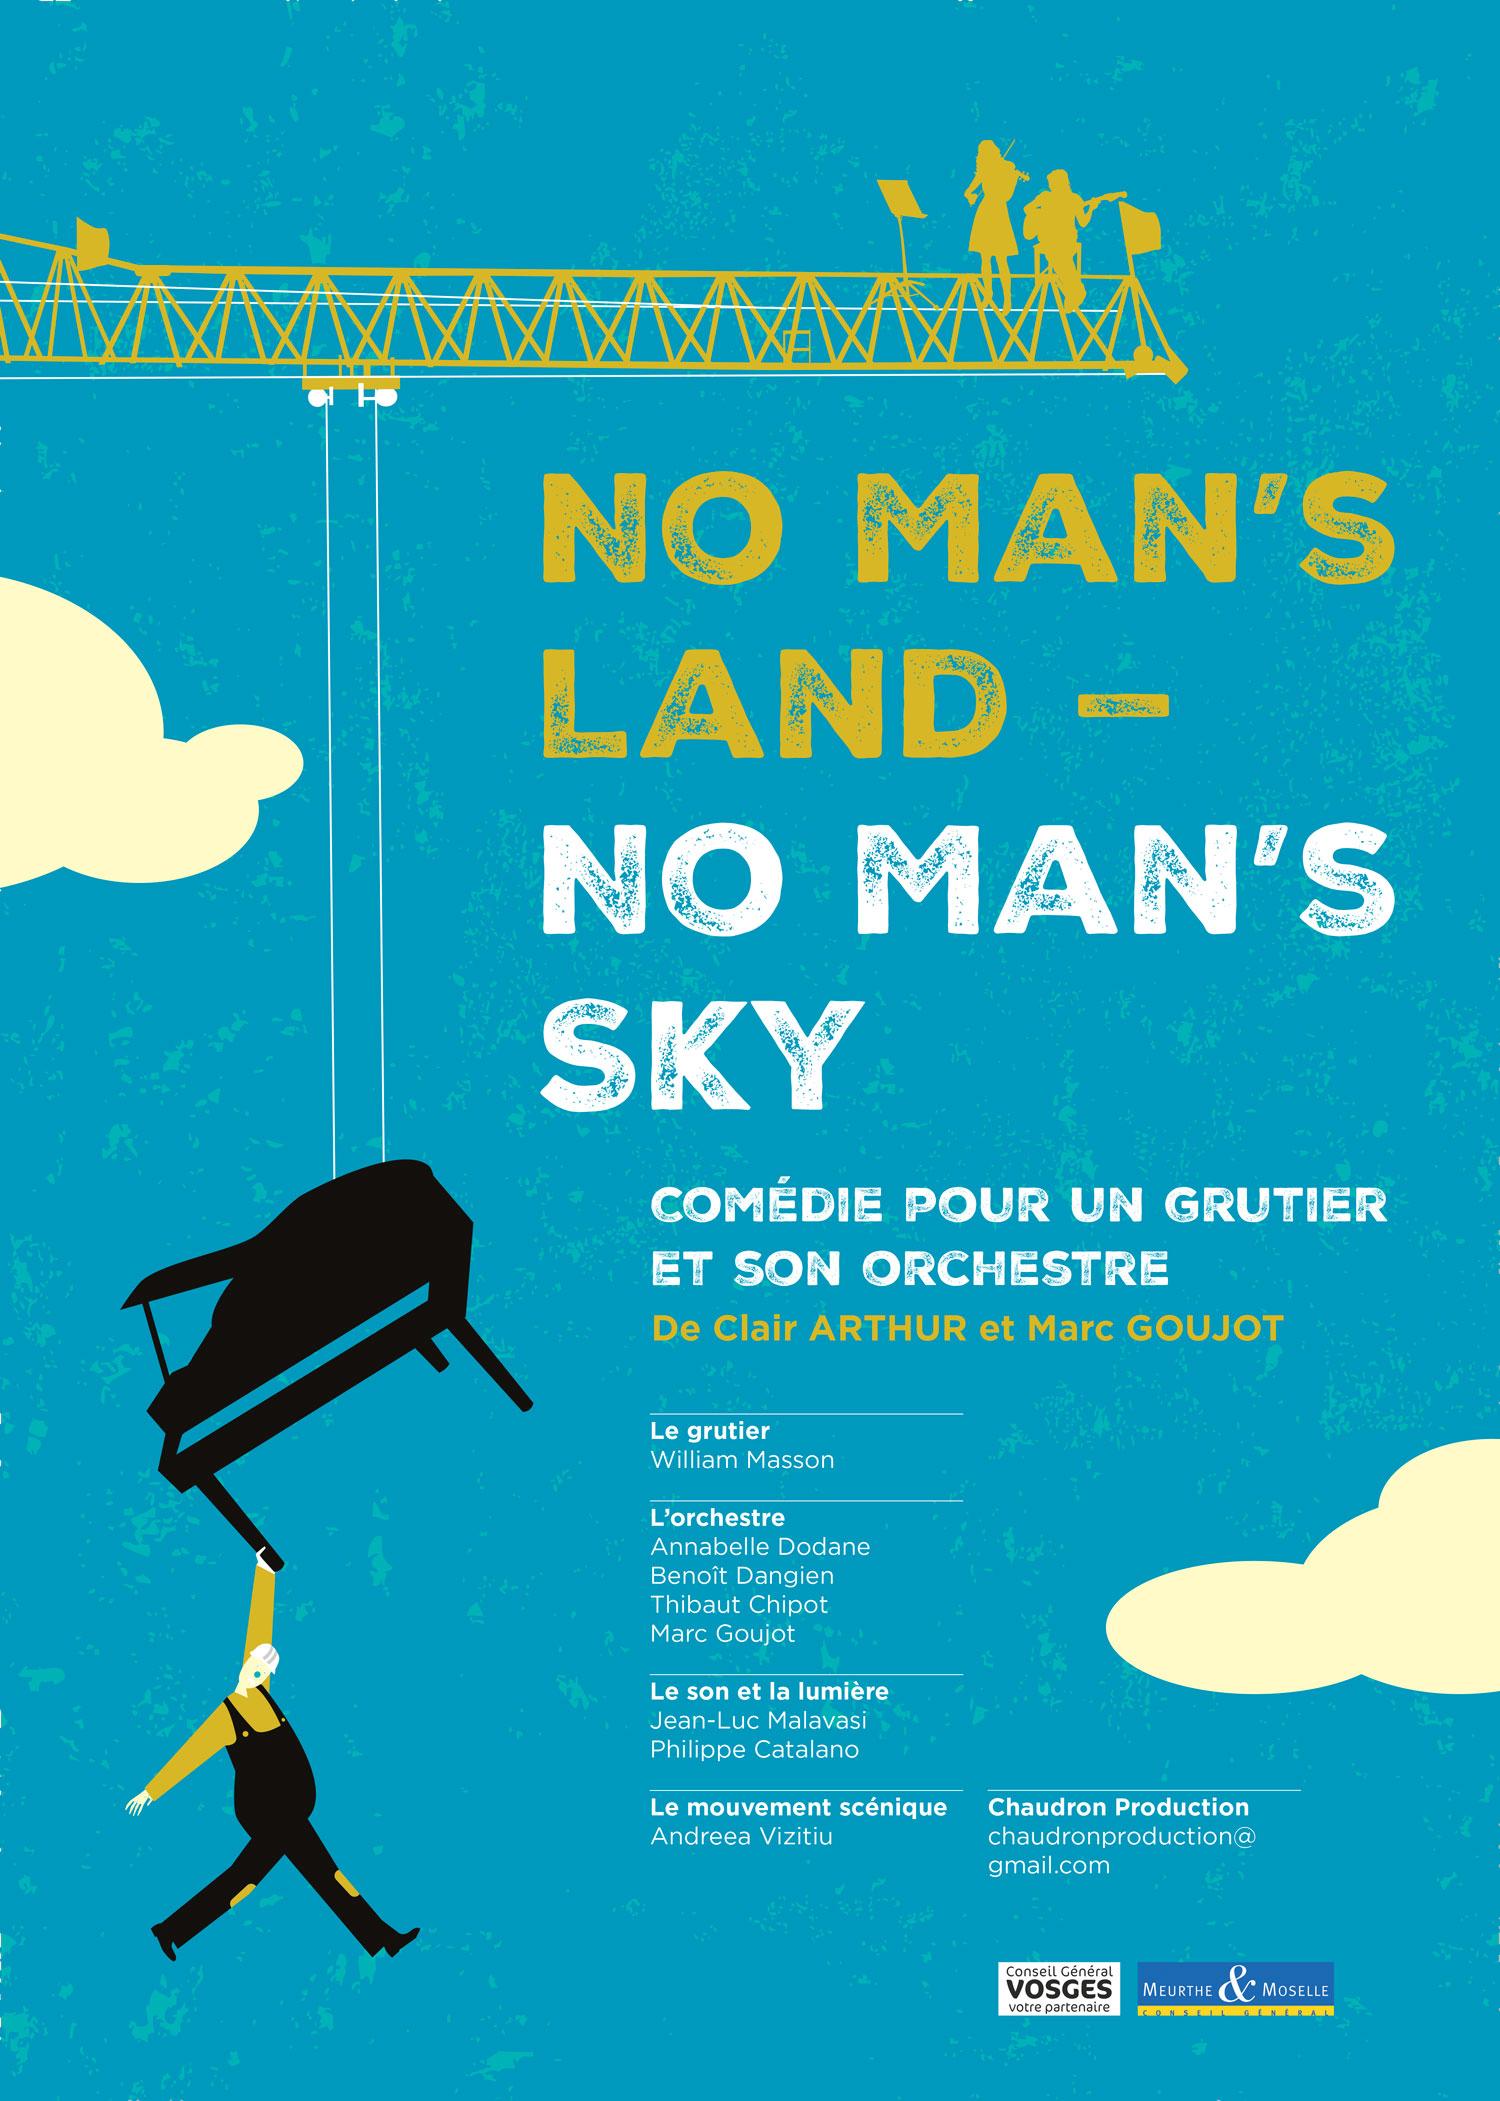 NoMansLand-NoMansSky-Affiche